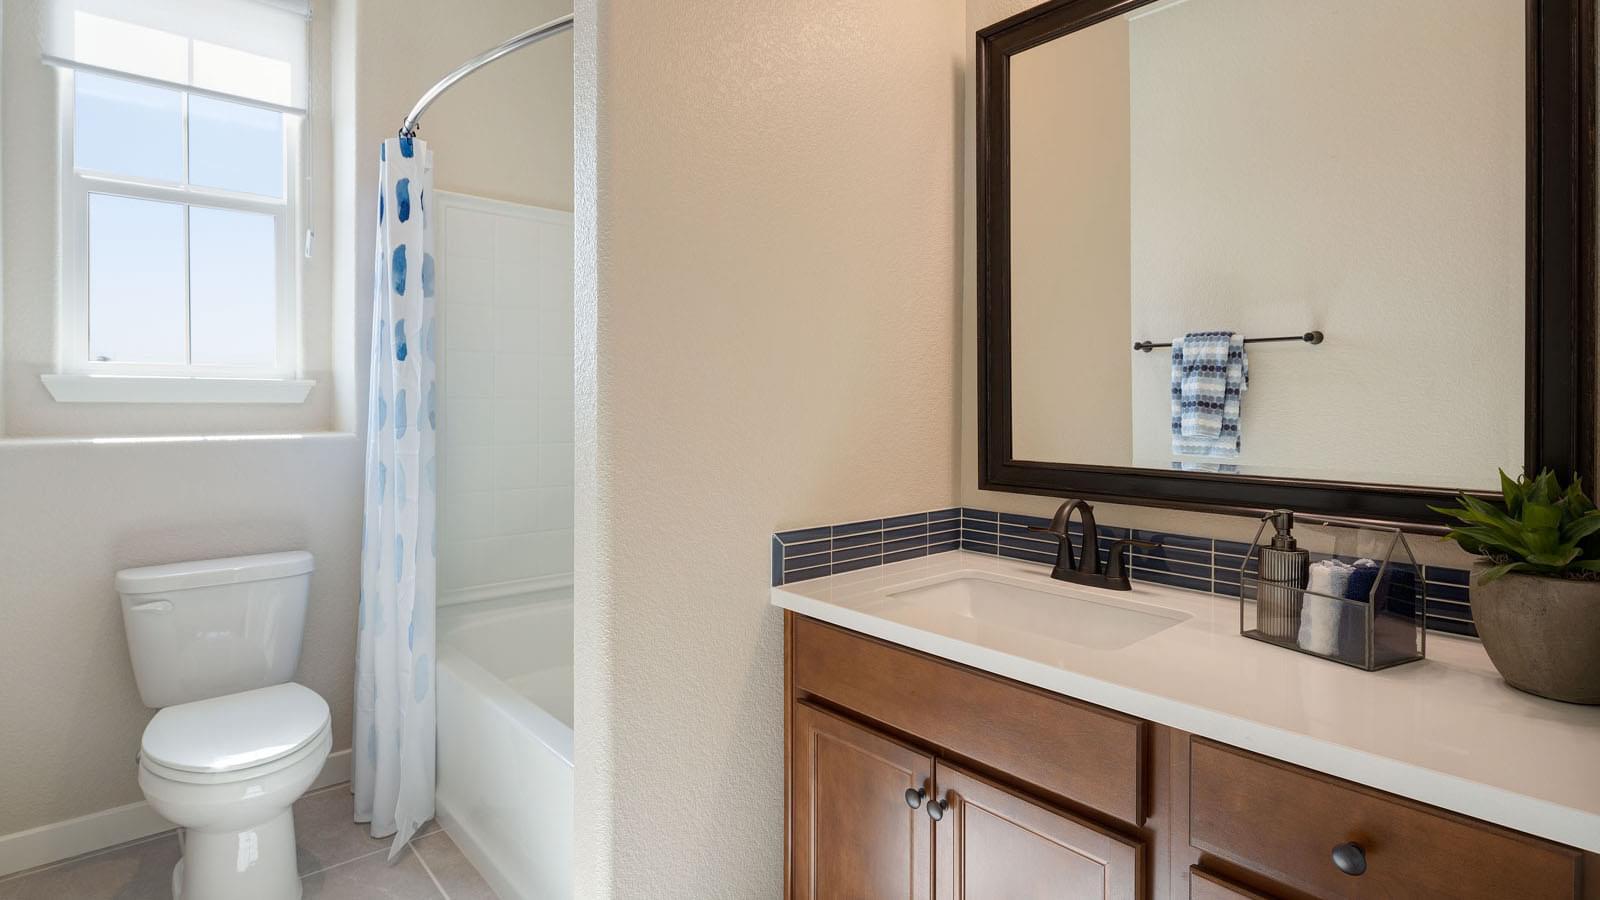 Residence 3 Bath 2